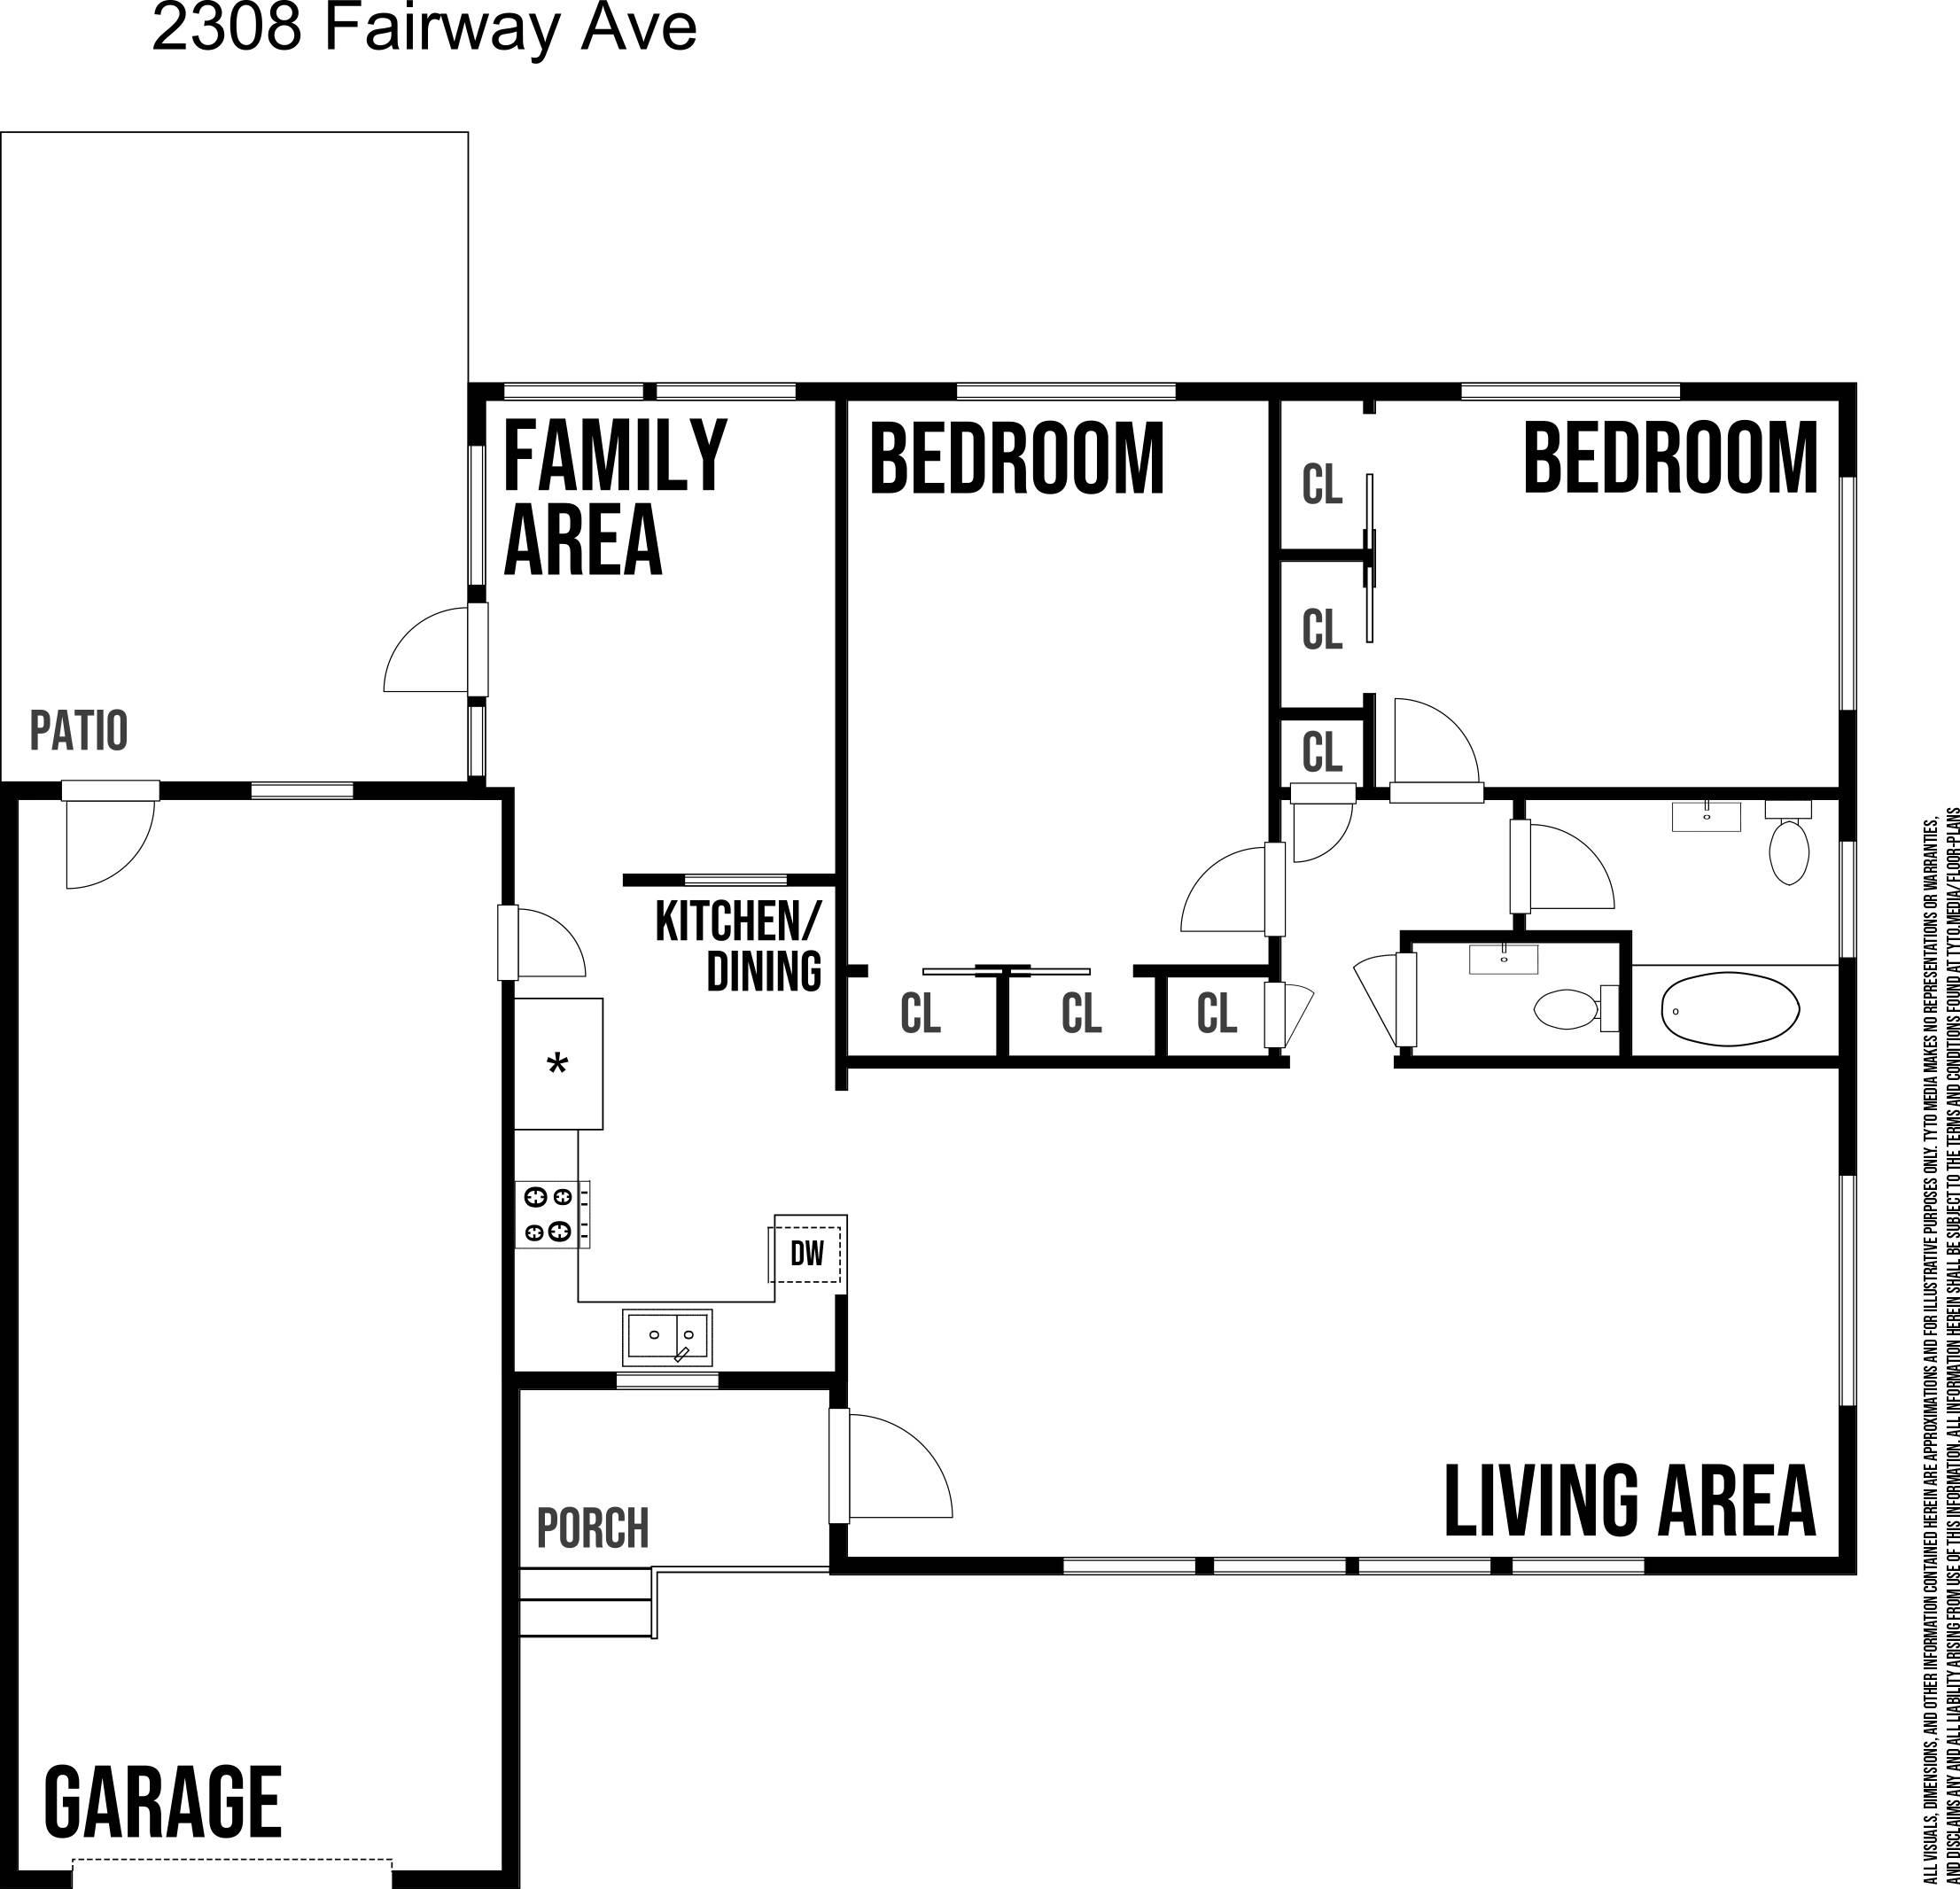 2308 Fairway Avenue S, St Petersburg, FL 33712